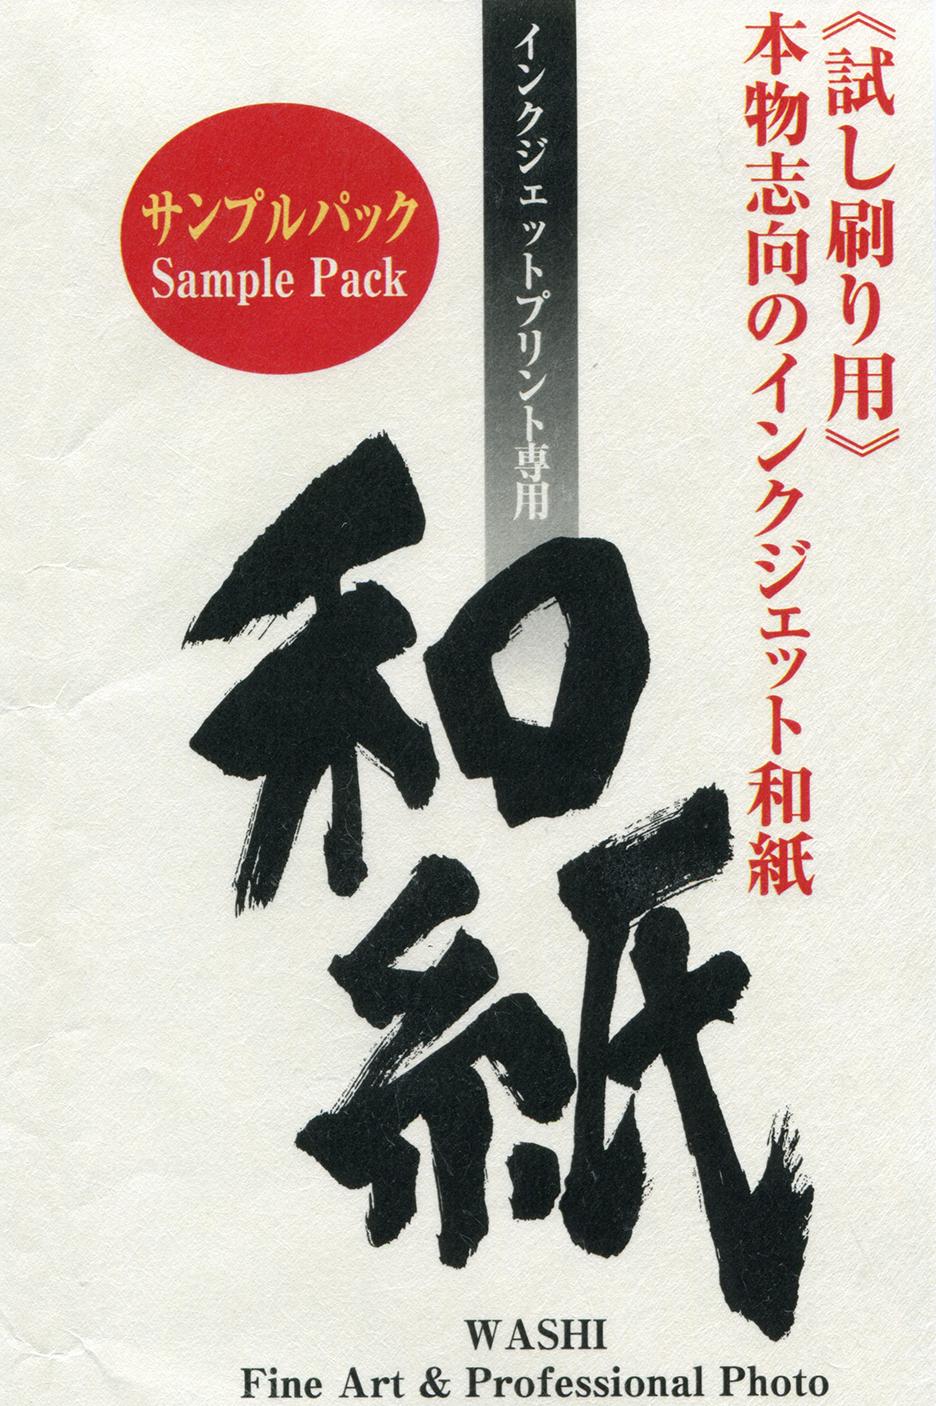 WashiSample.jpg